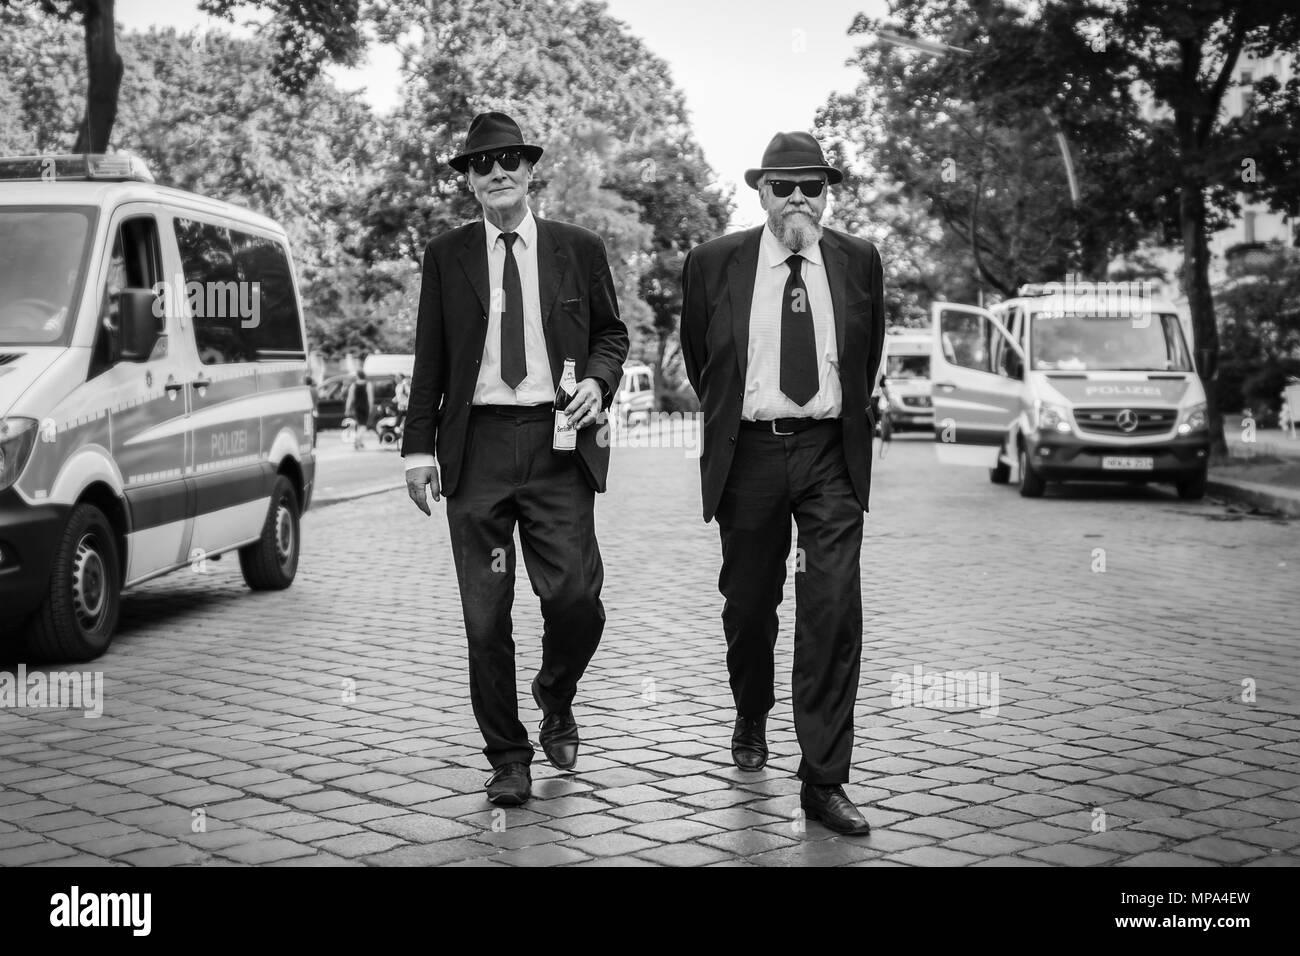 Two gentlemen dressed as the Blues Brothers attend Karneval der Kulturen 2018. - Stock Image